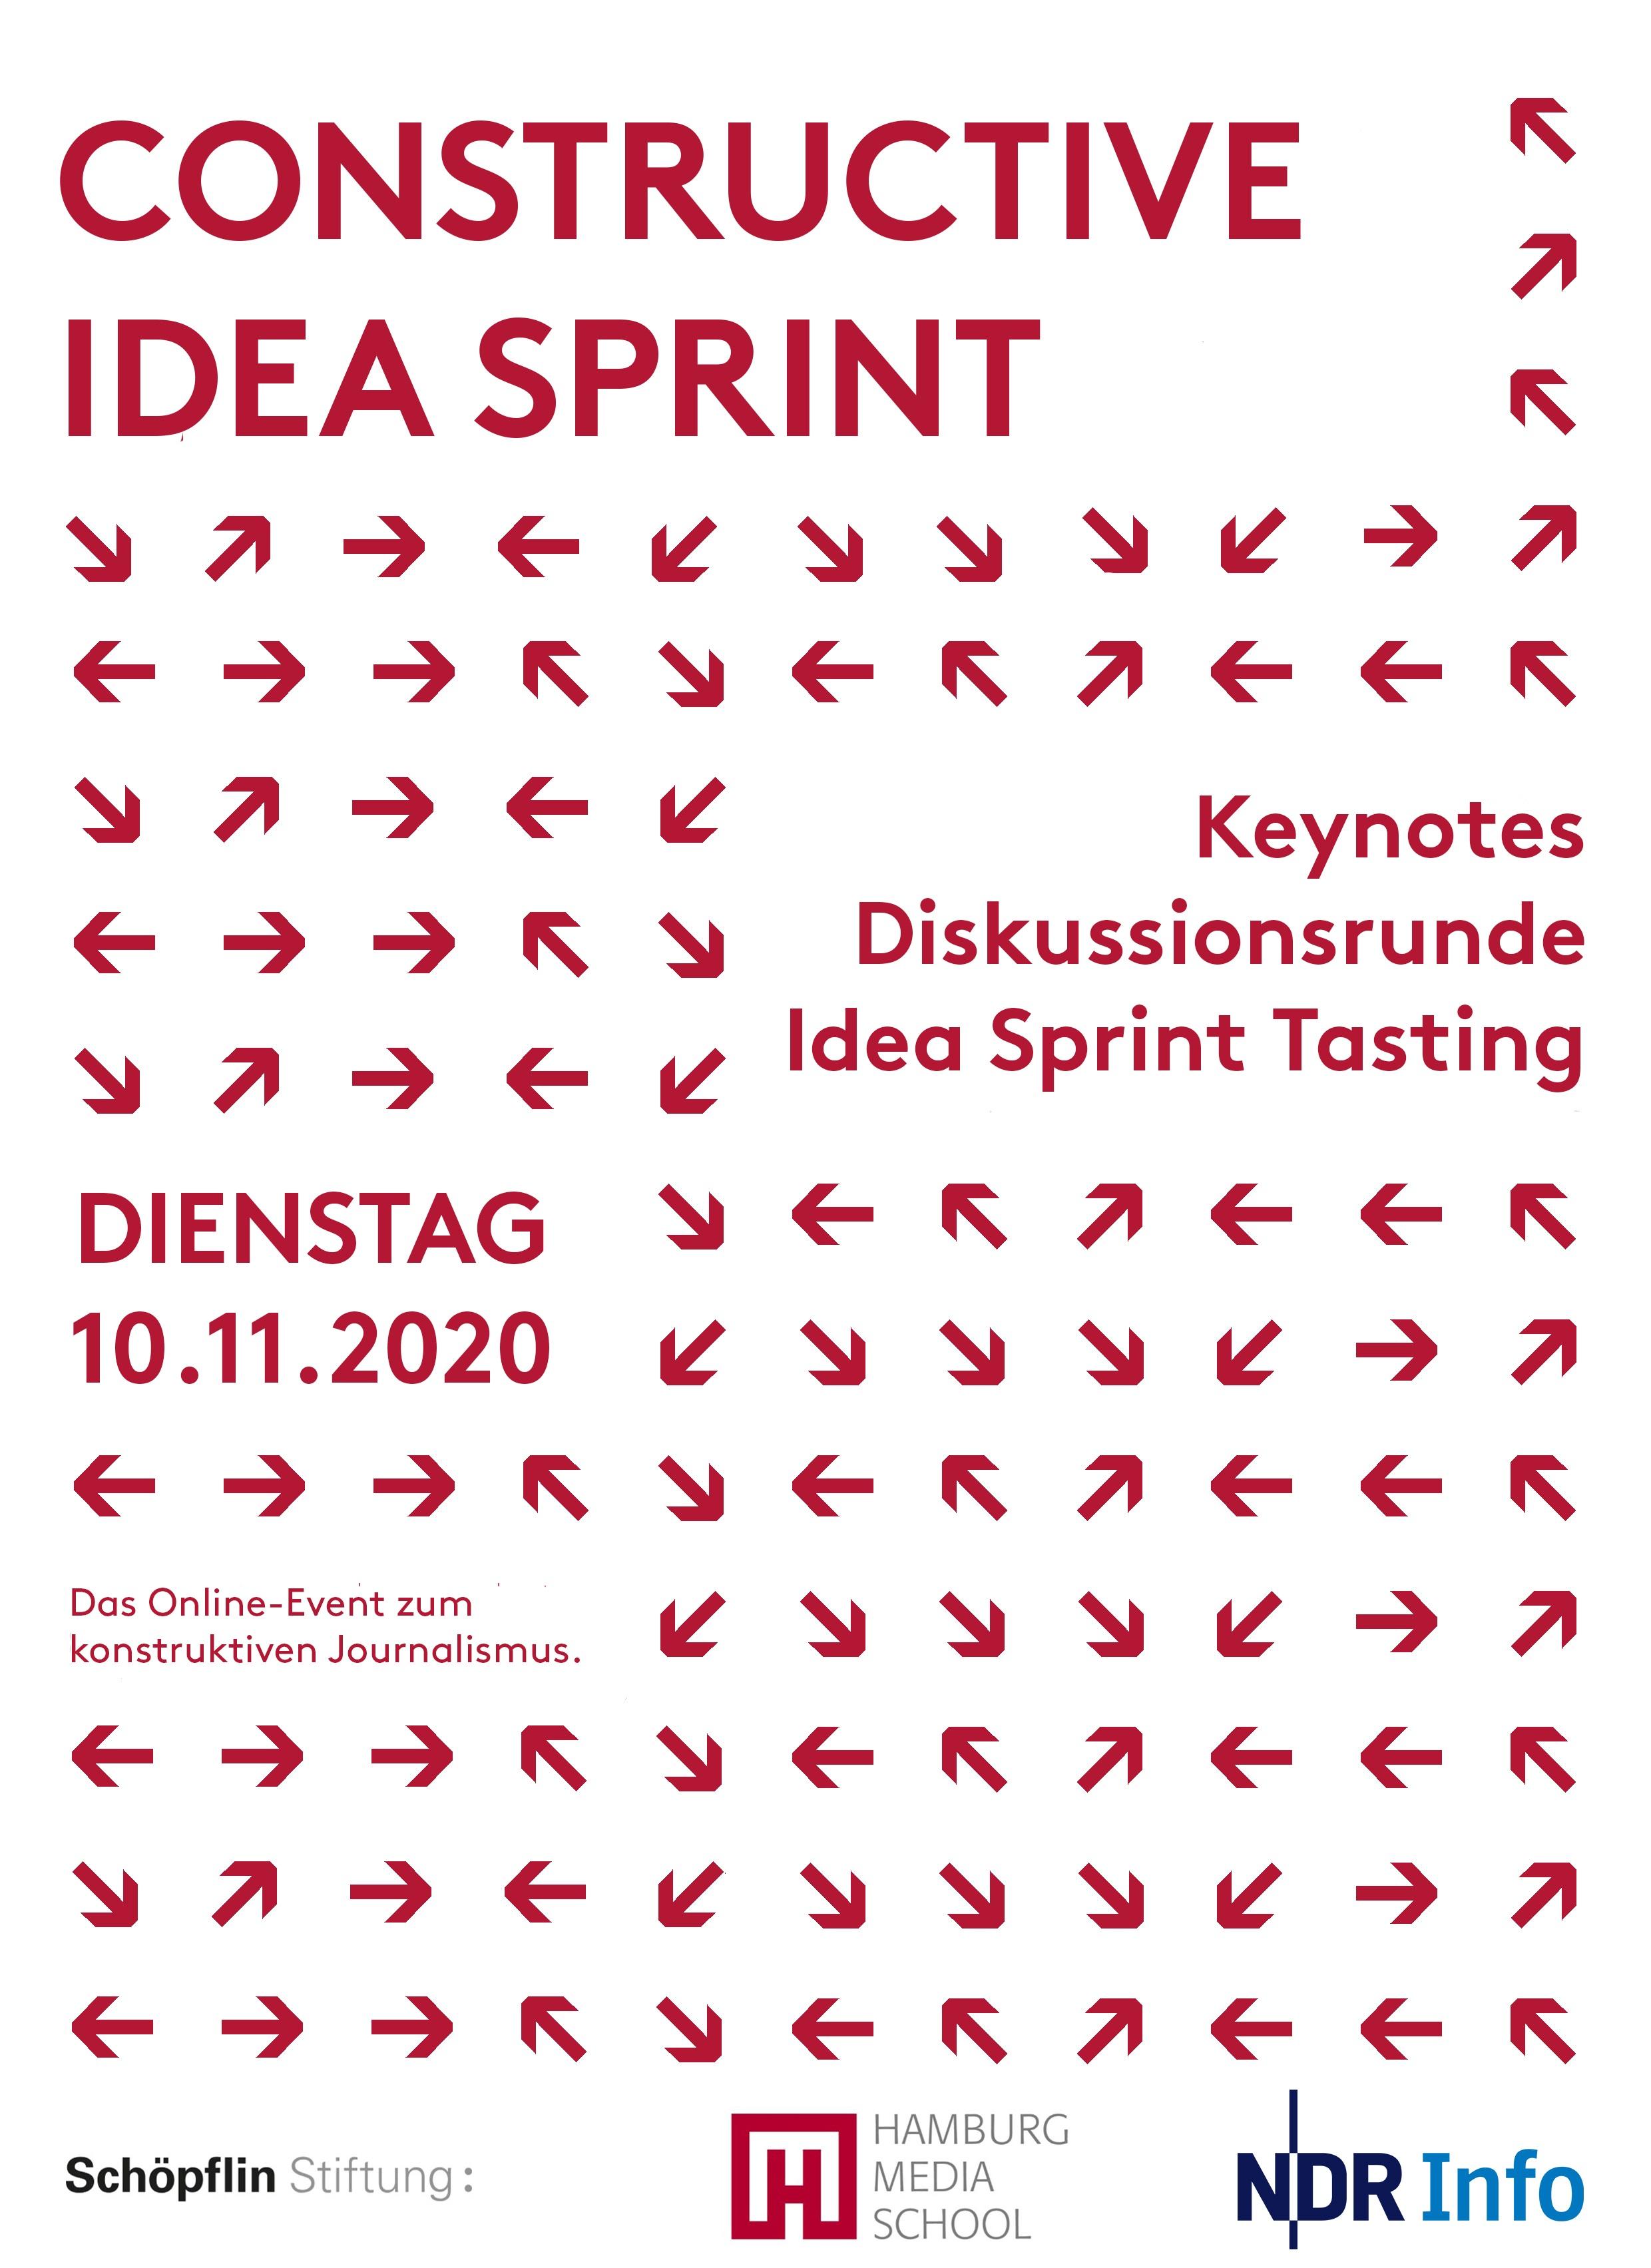 Constructive Idea Sprint 2020